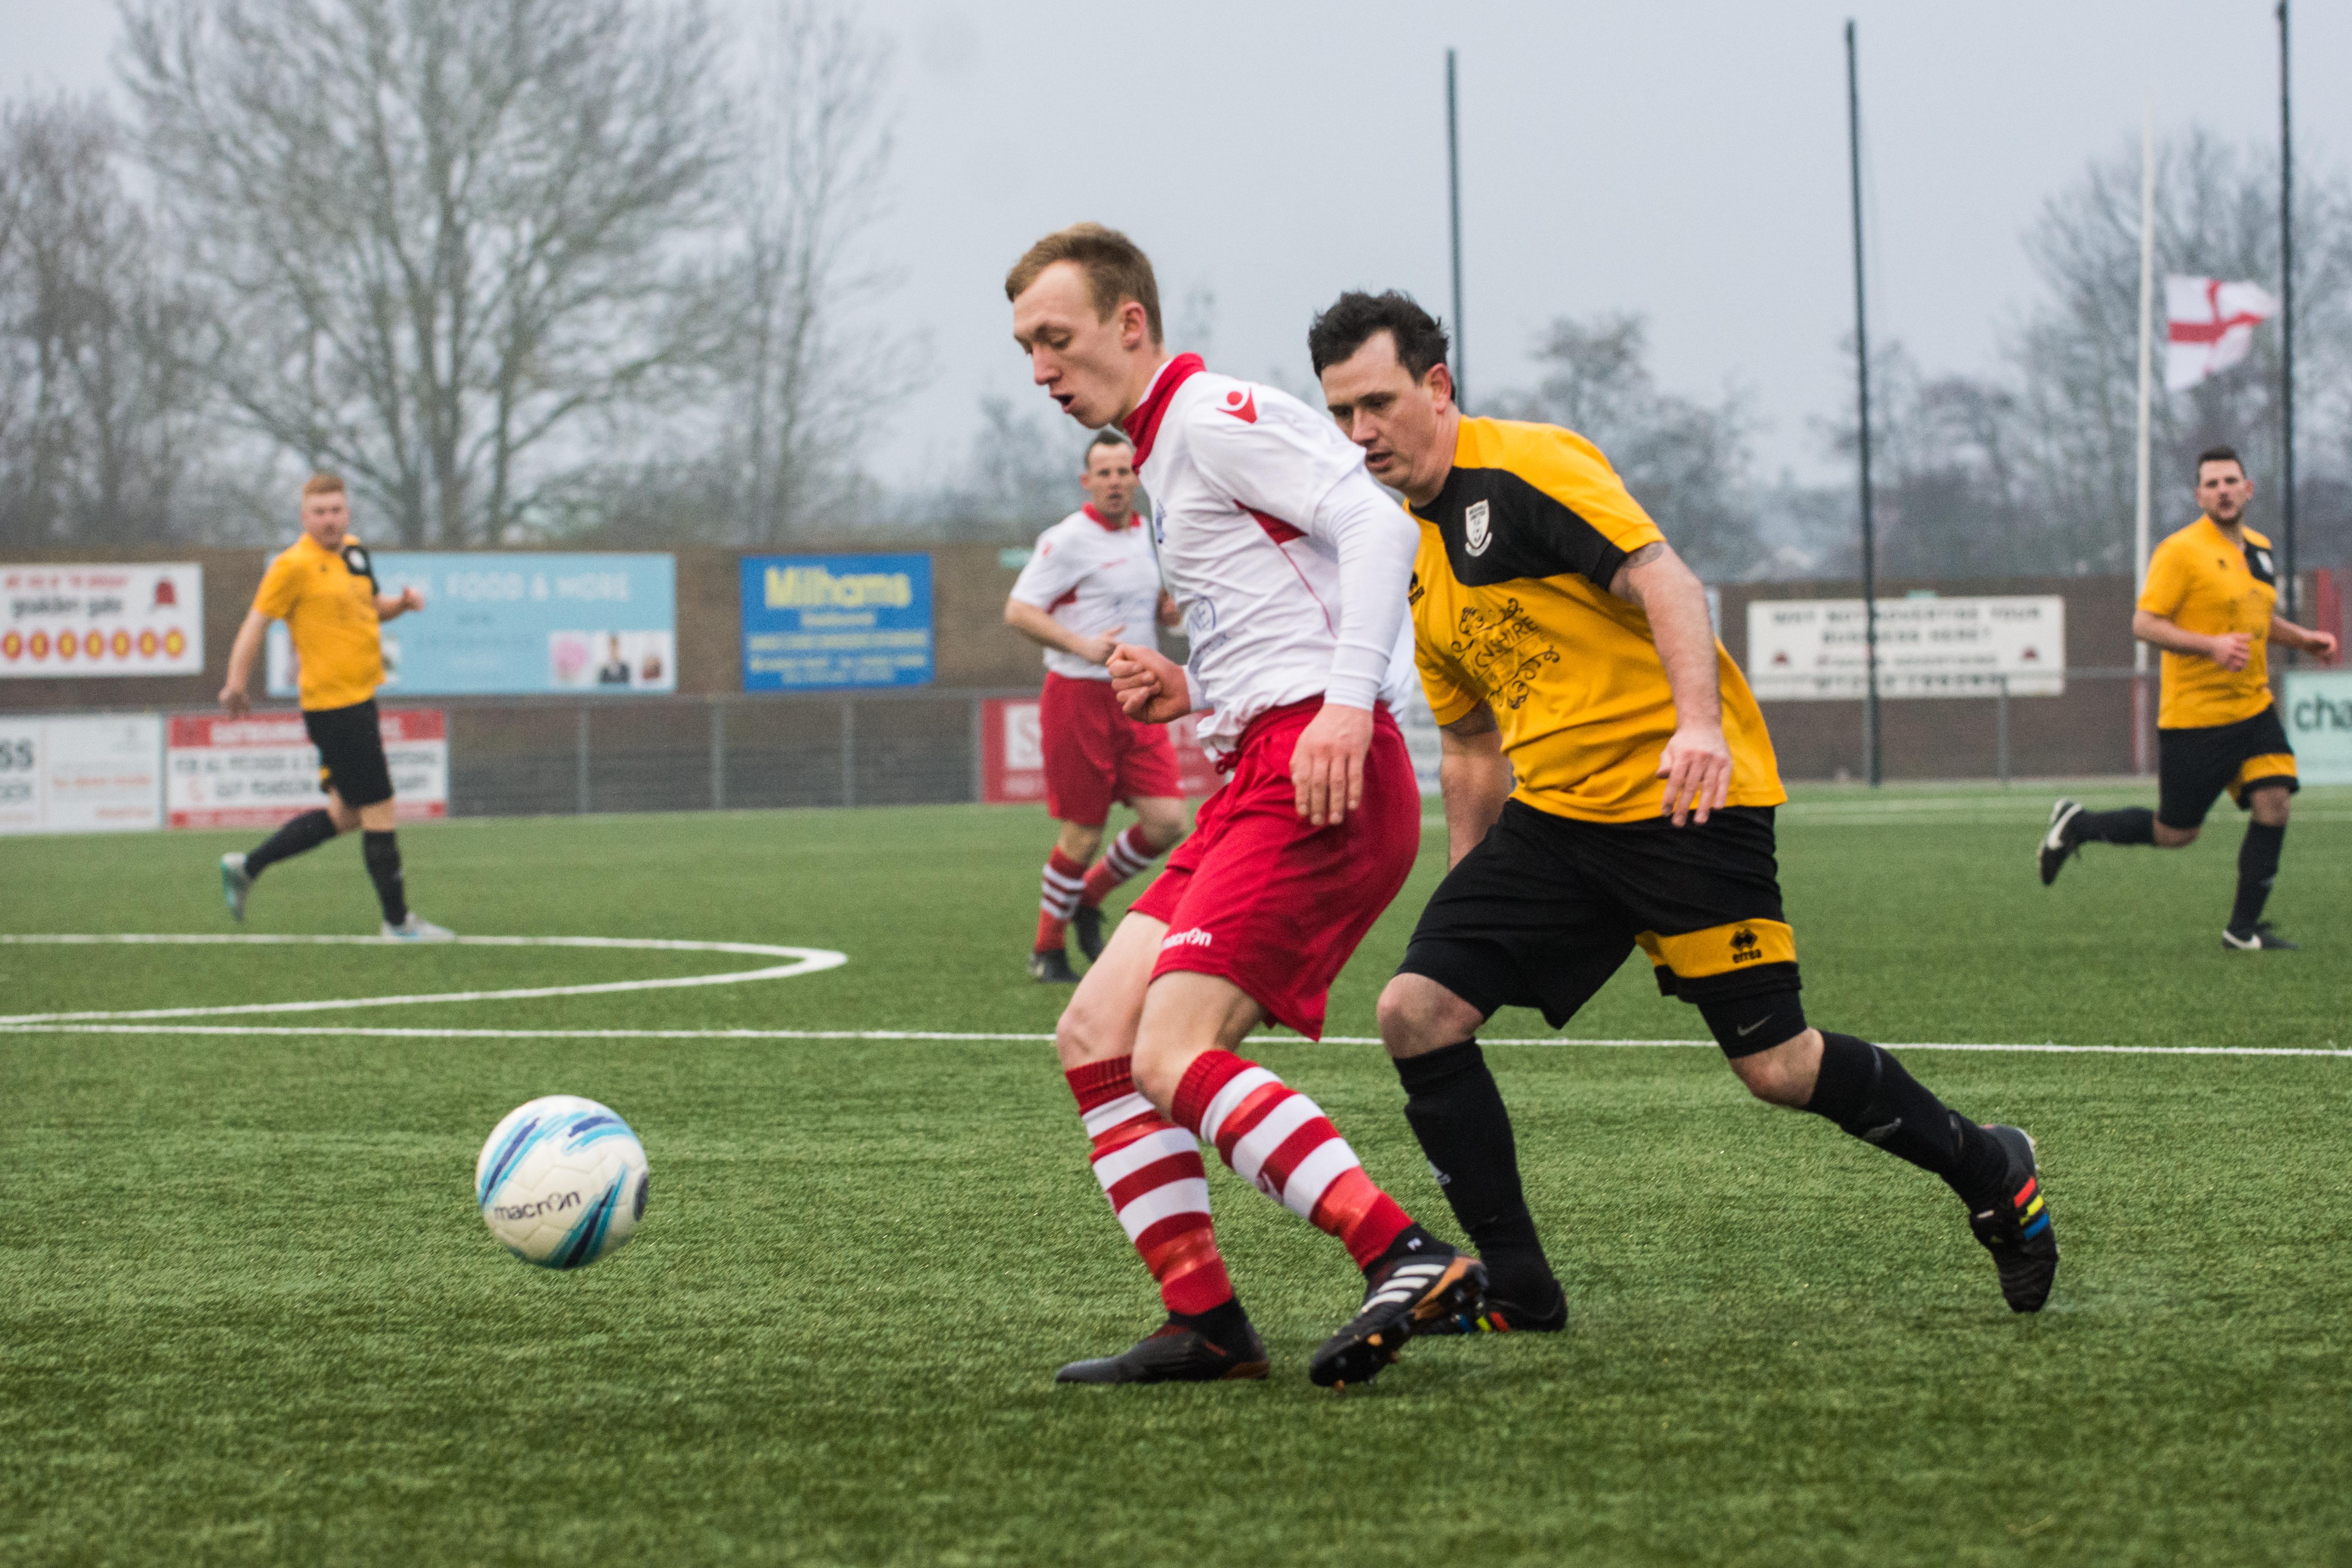 DAVID_JEFFERY Langney Wanderers FC vs Bexhill United FC 03.03.18 71